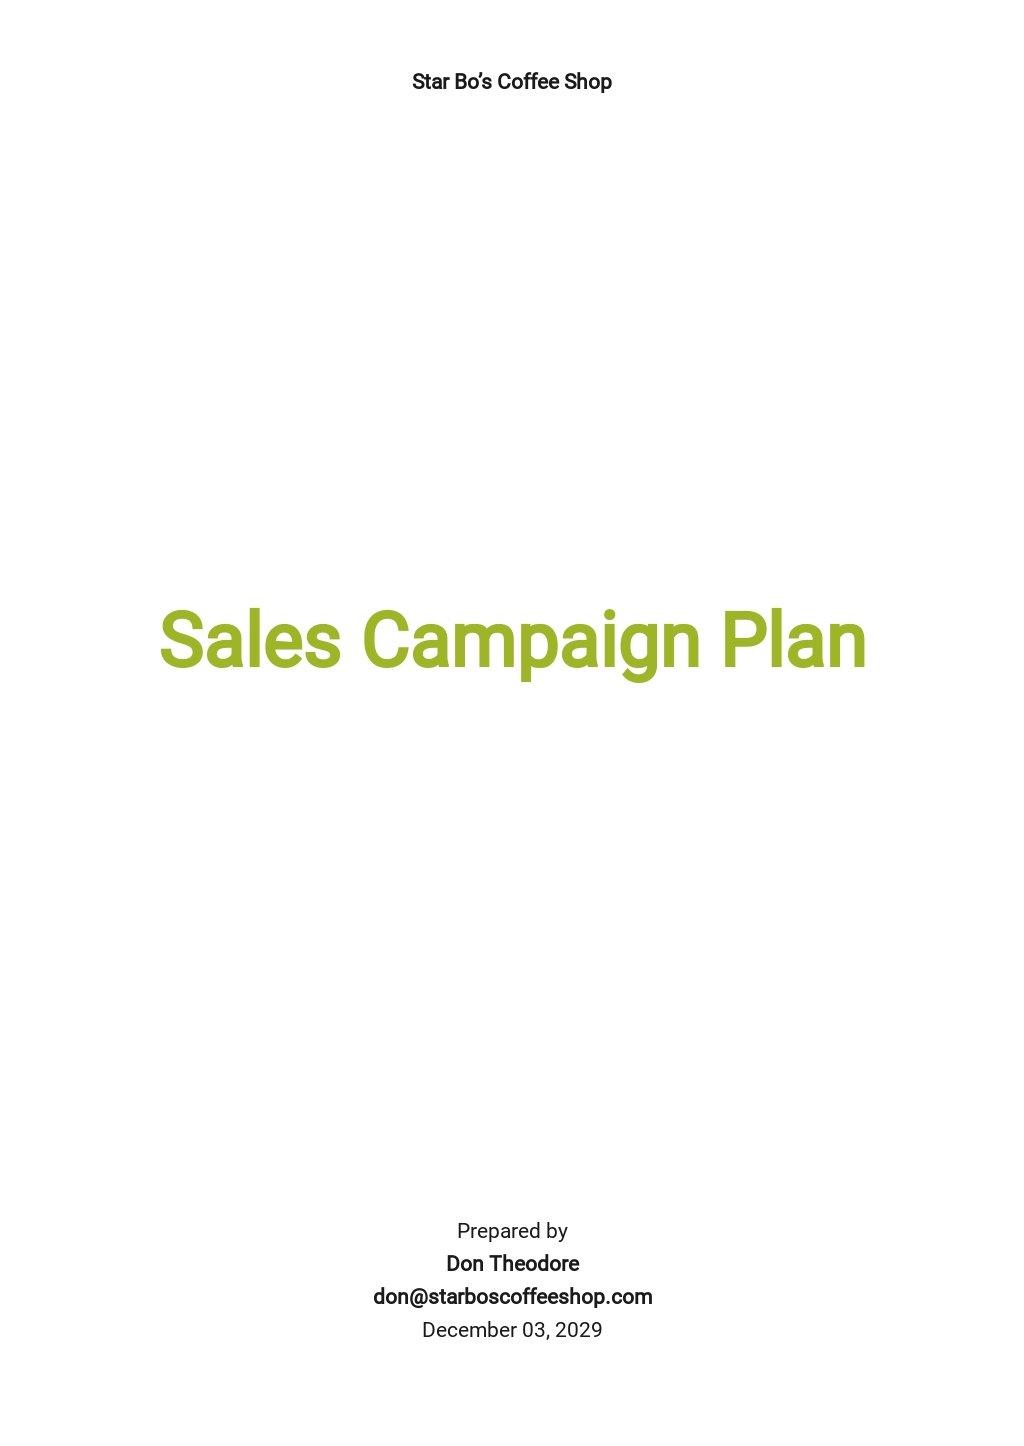 Sales Campaign Plan Template